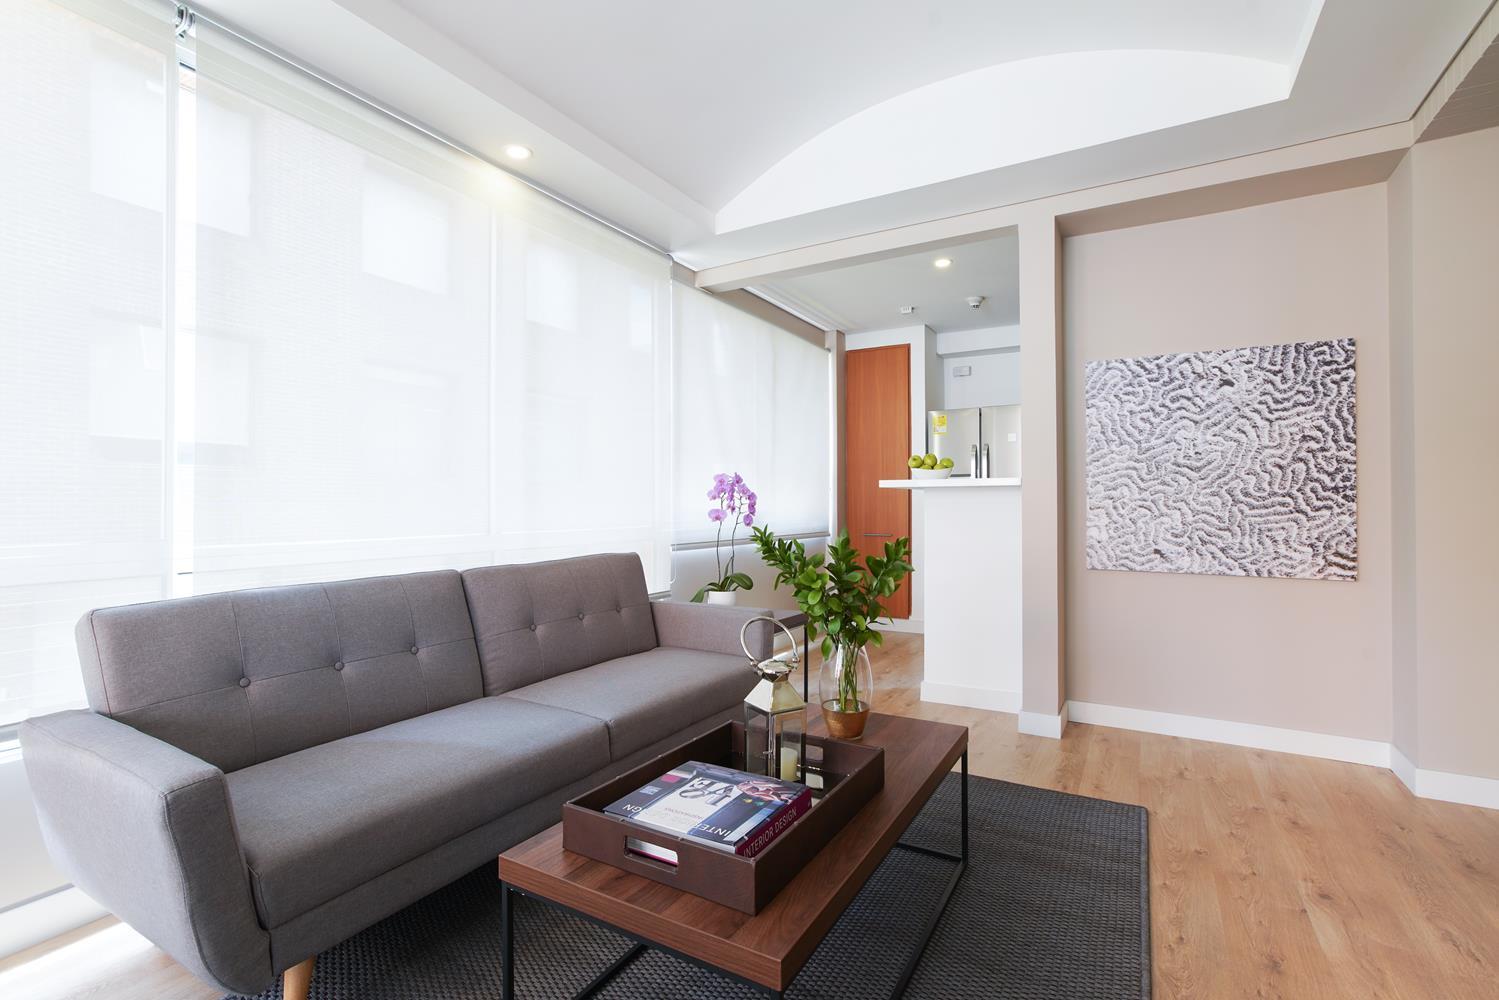 Sofa at Soho93 Apartments